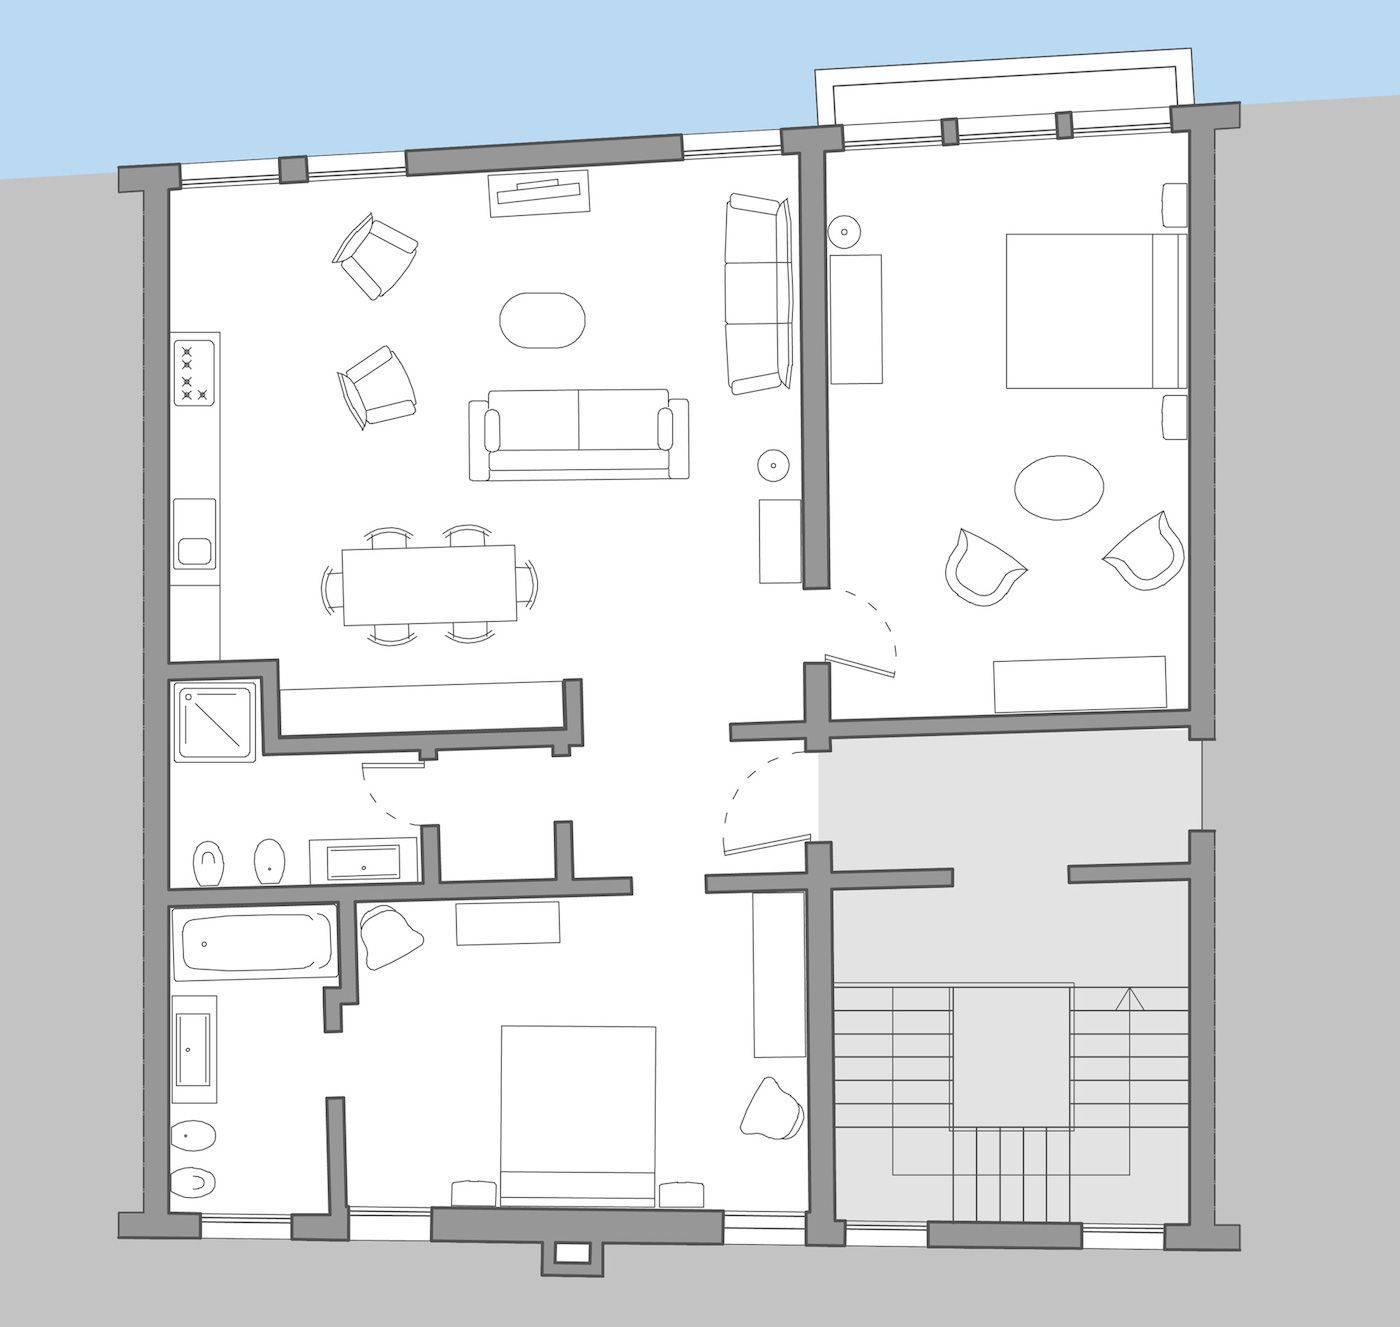 Giorgione floor plan